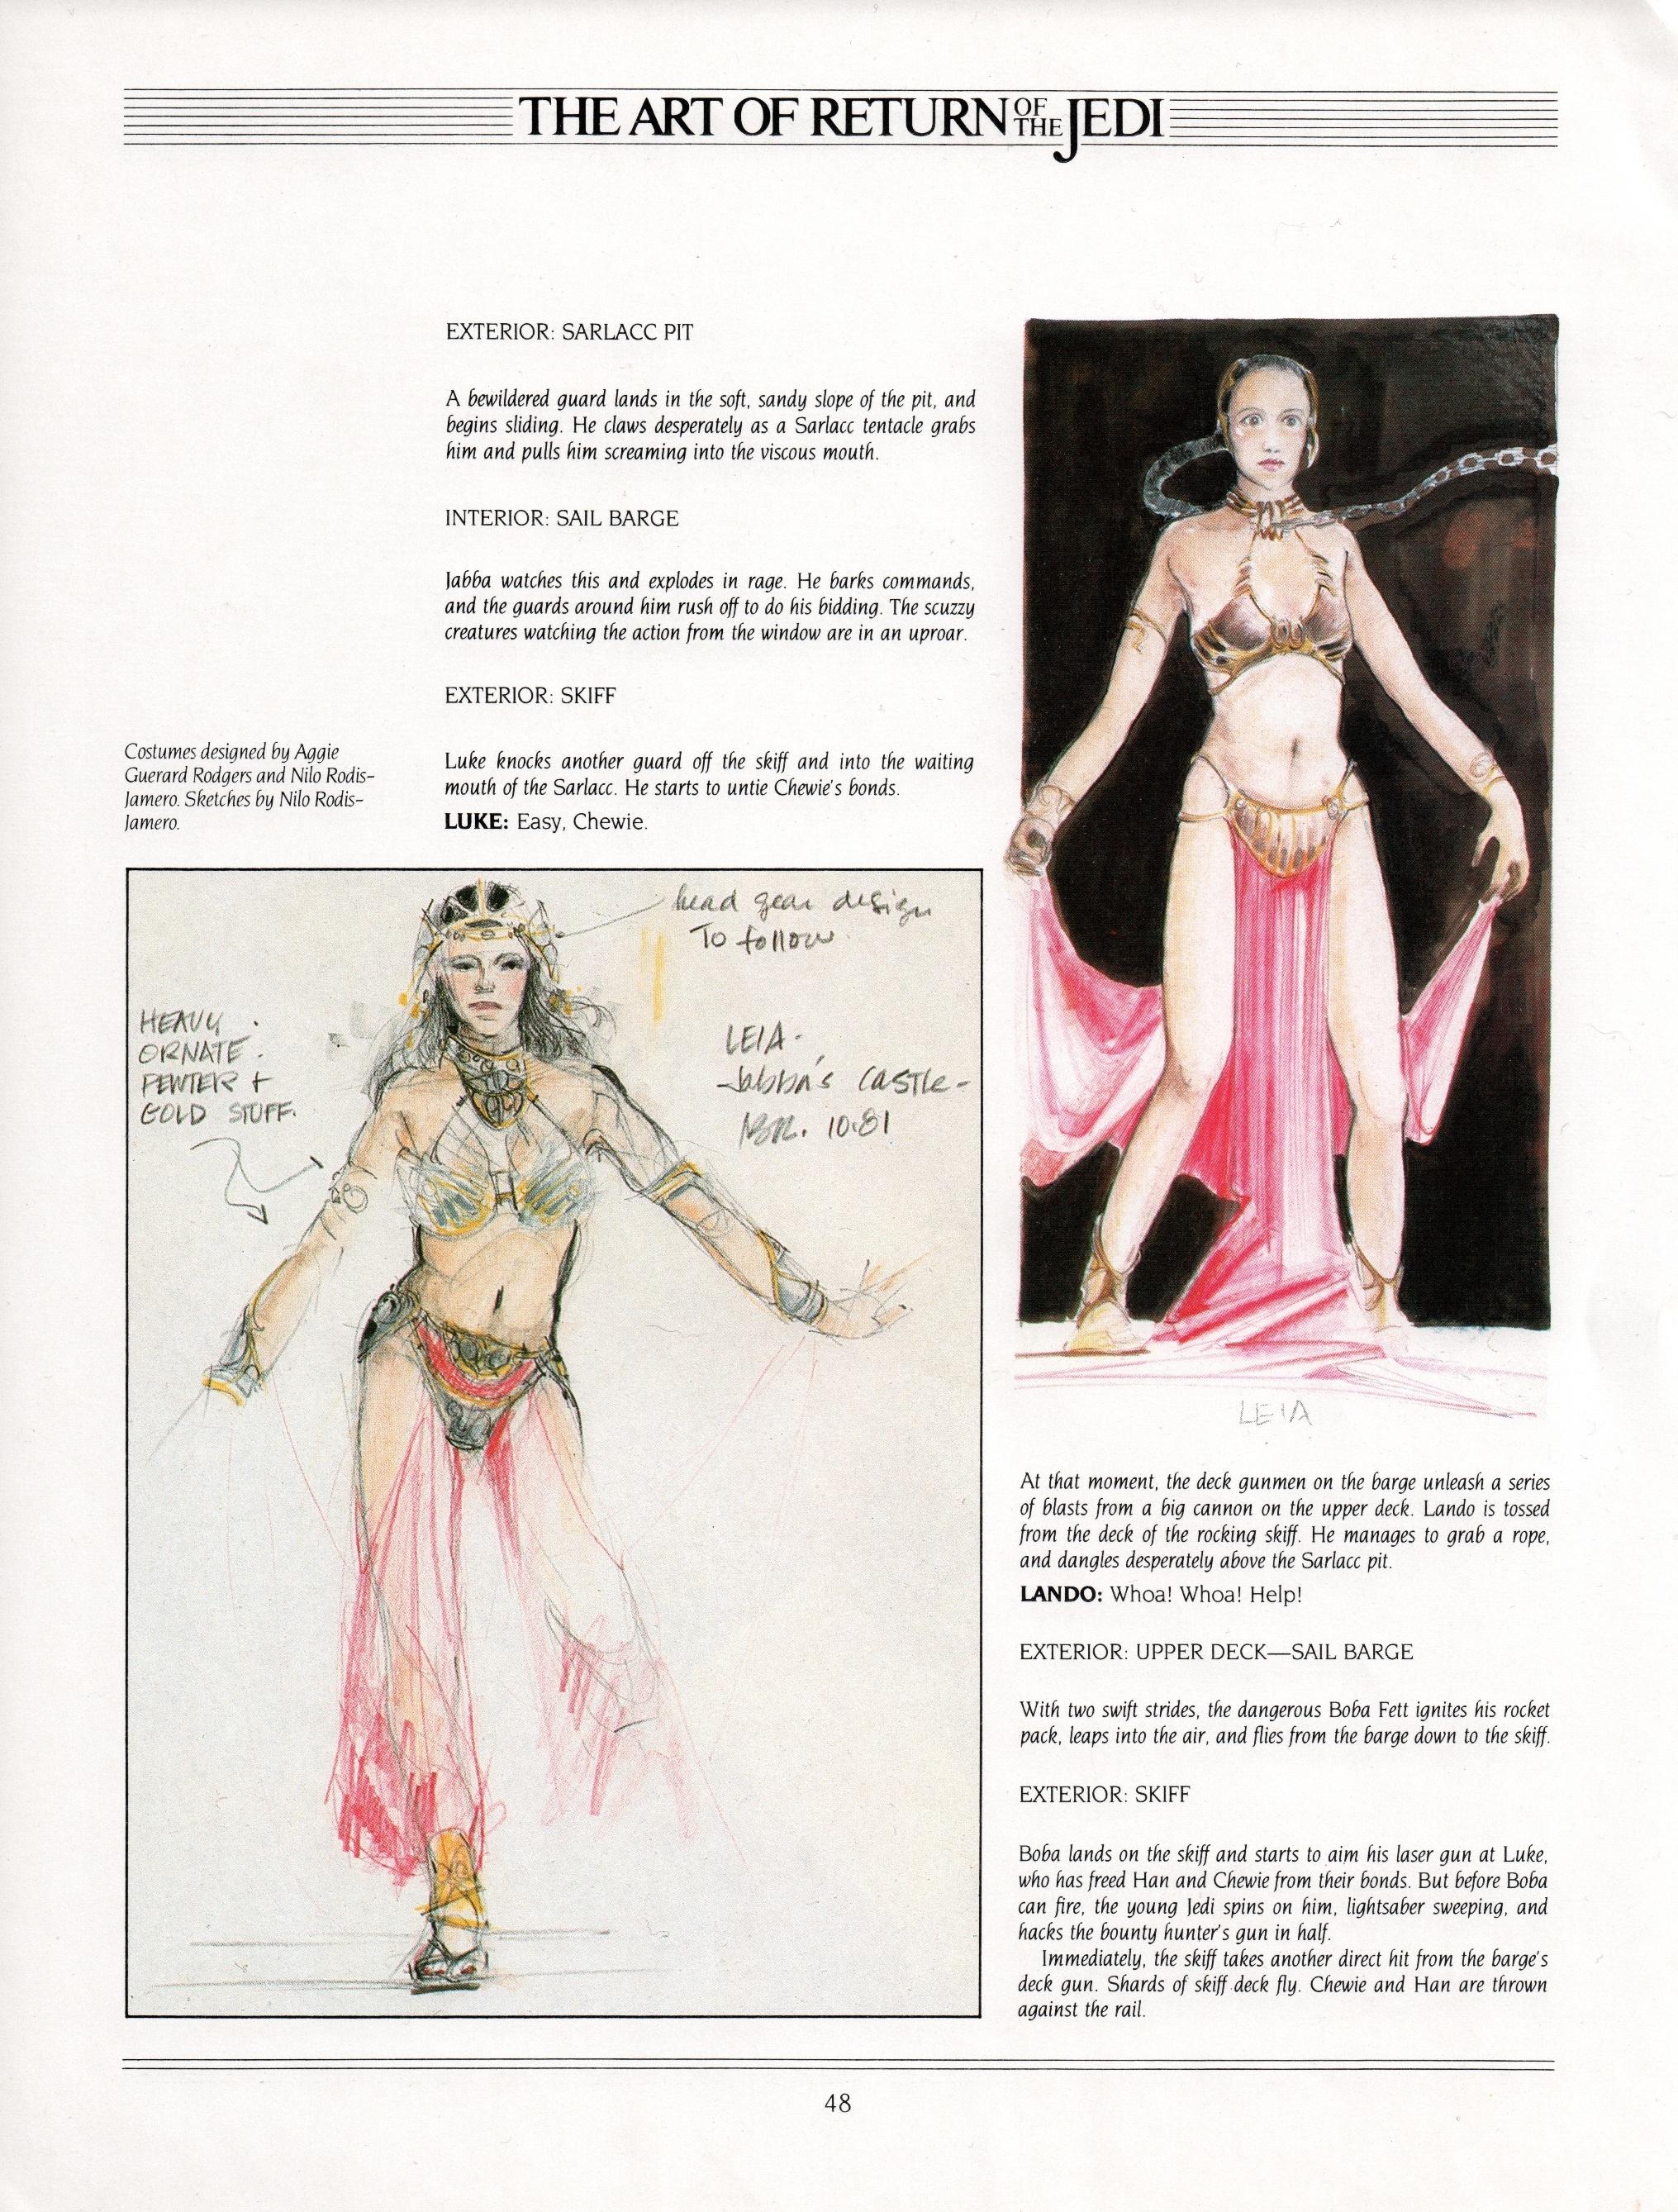 Art of Return of the Jedi (b0bafett_Empire)-p048